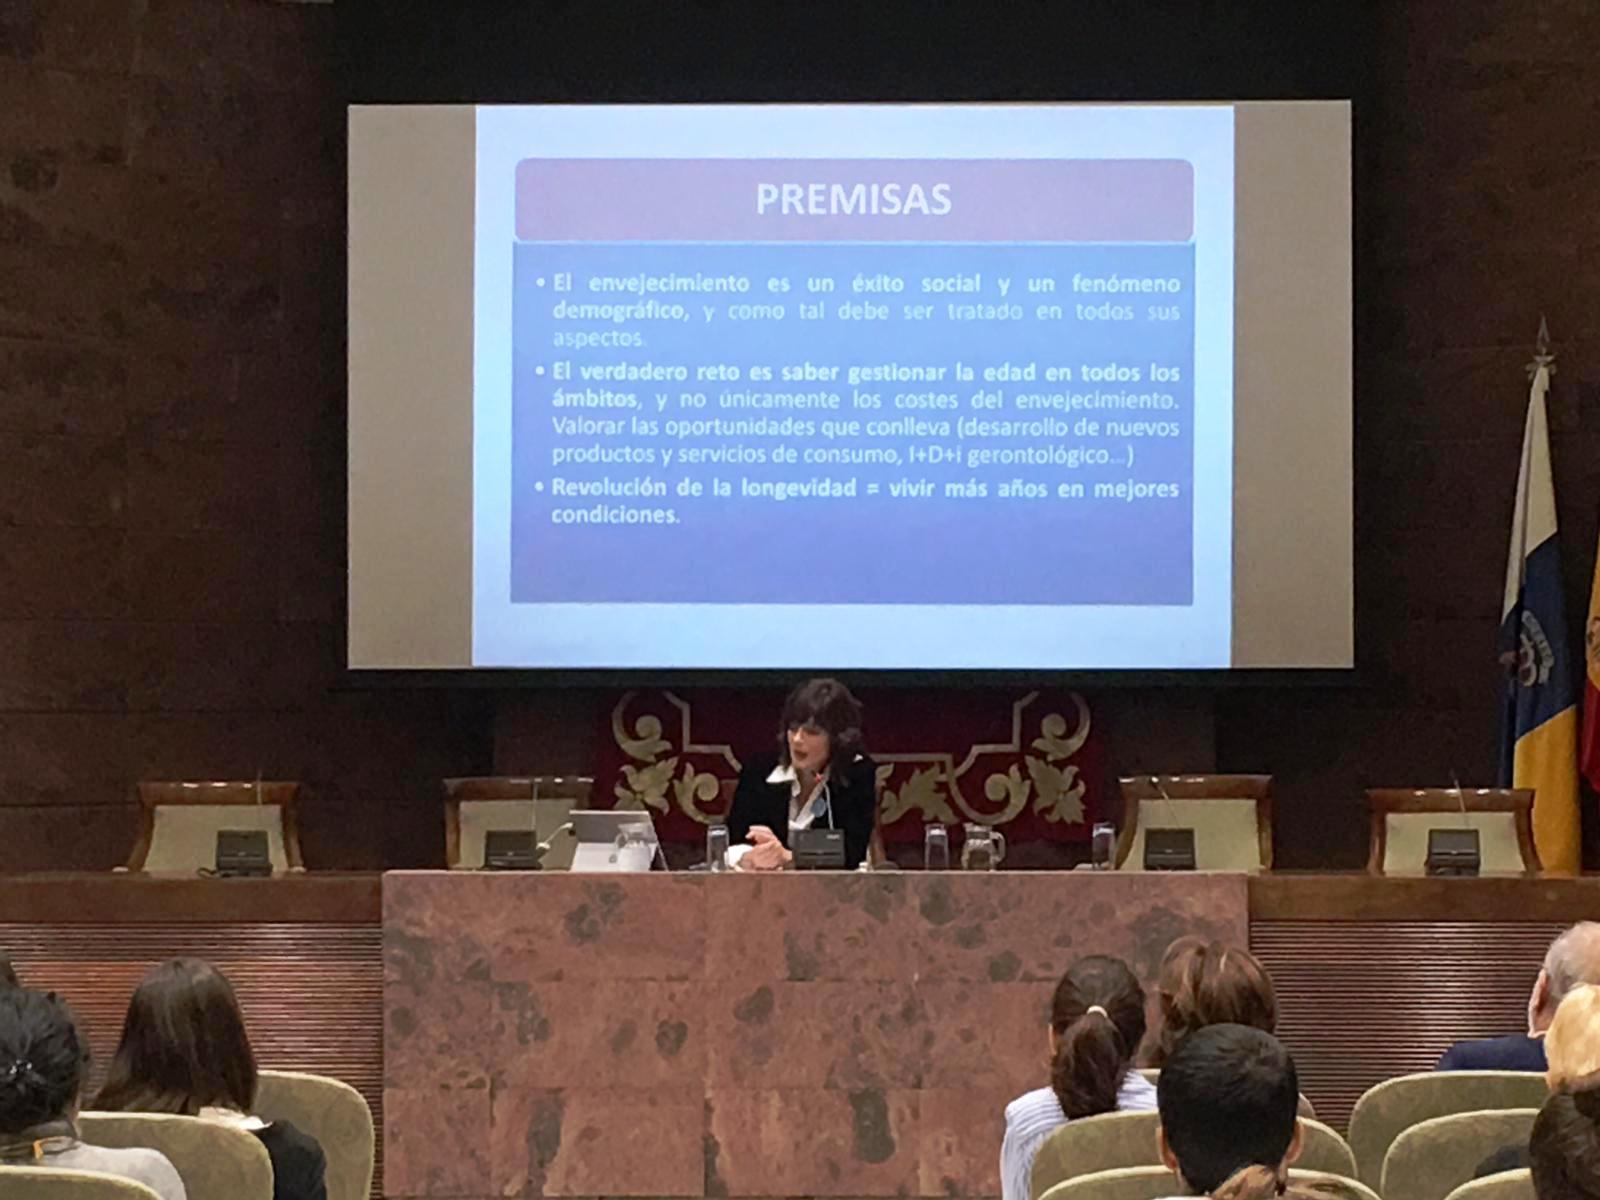 10_12_18_Amilibia_mayores_Tenerife_Parlamento__3_.JPG